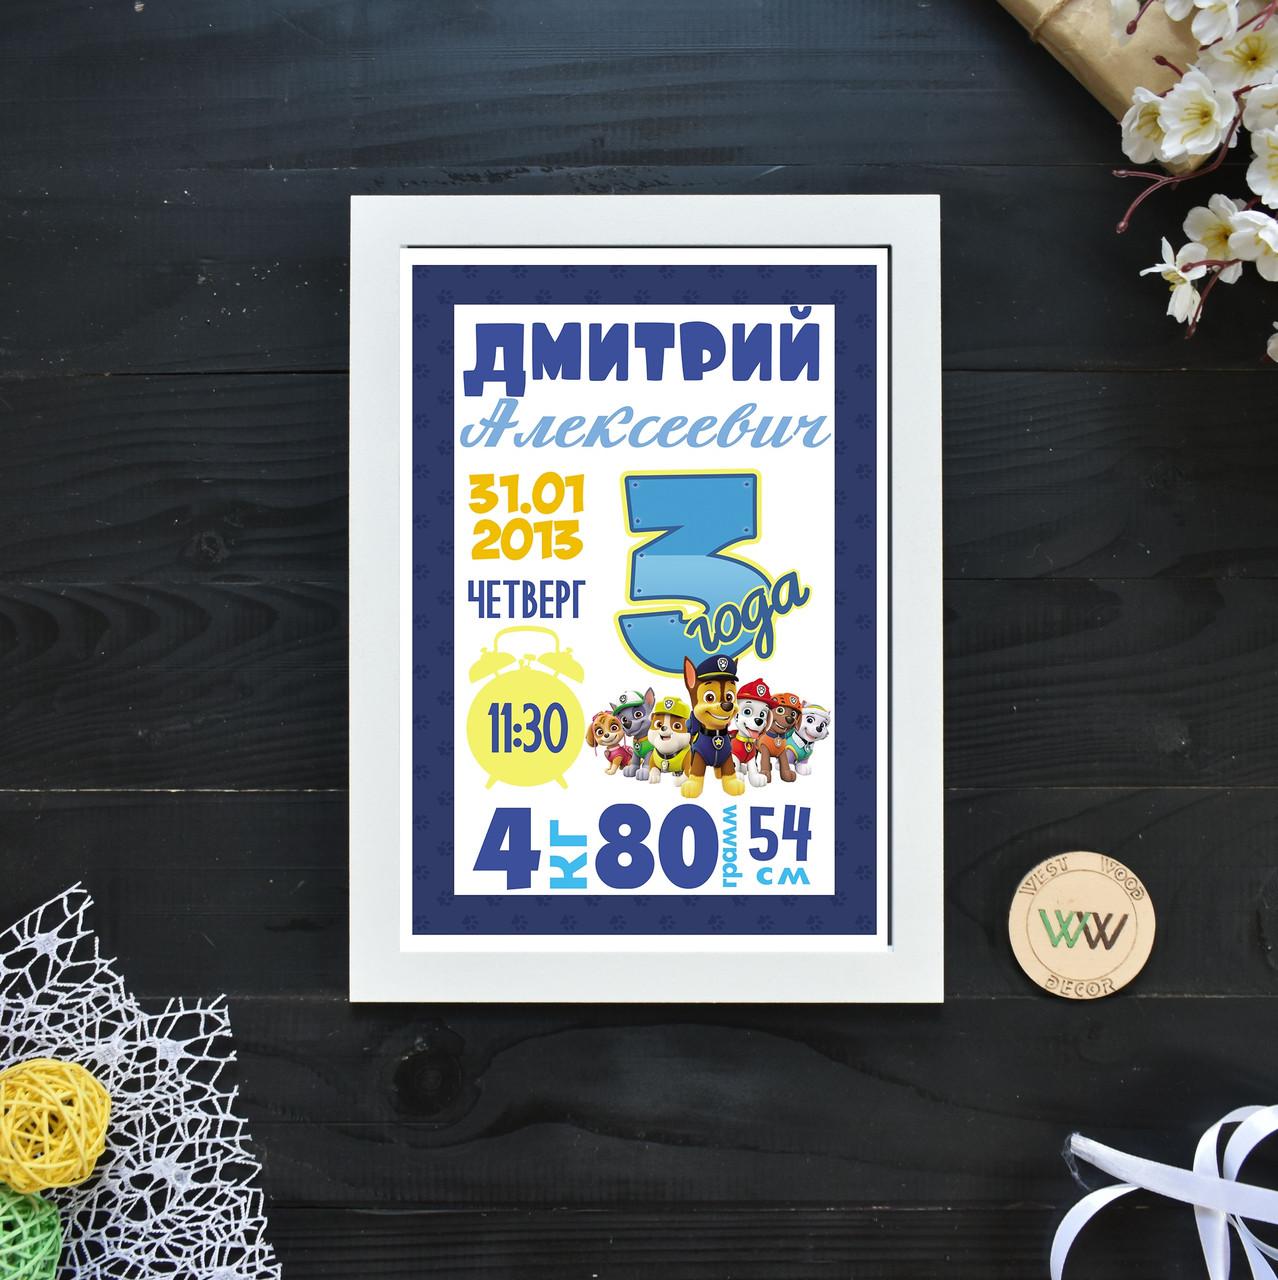 Метрика-постер, бумажная метрика, метрика печать. Щенячий патруль, 3 года